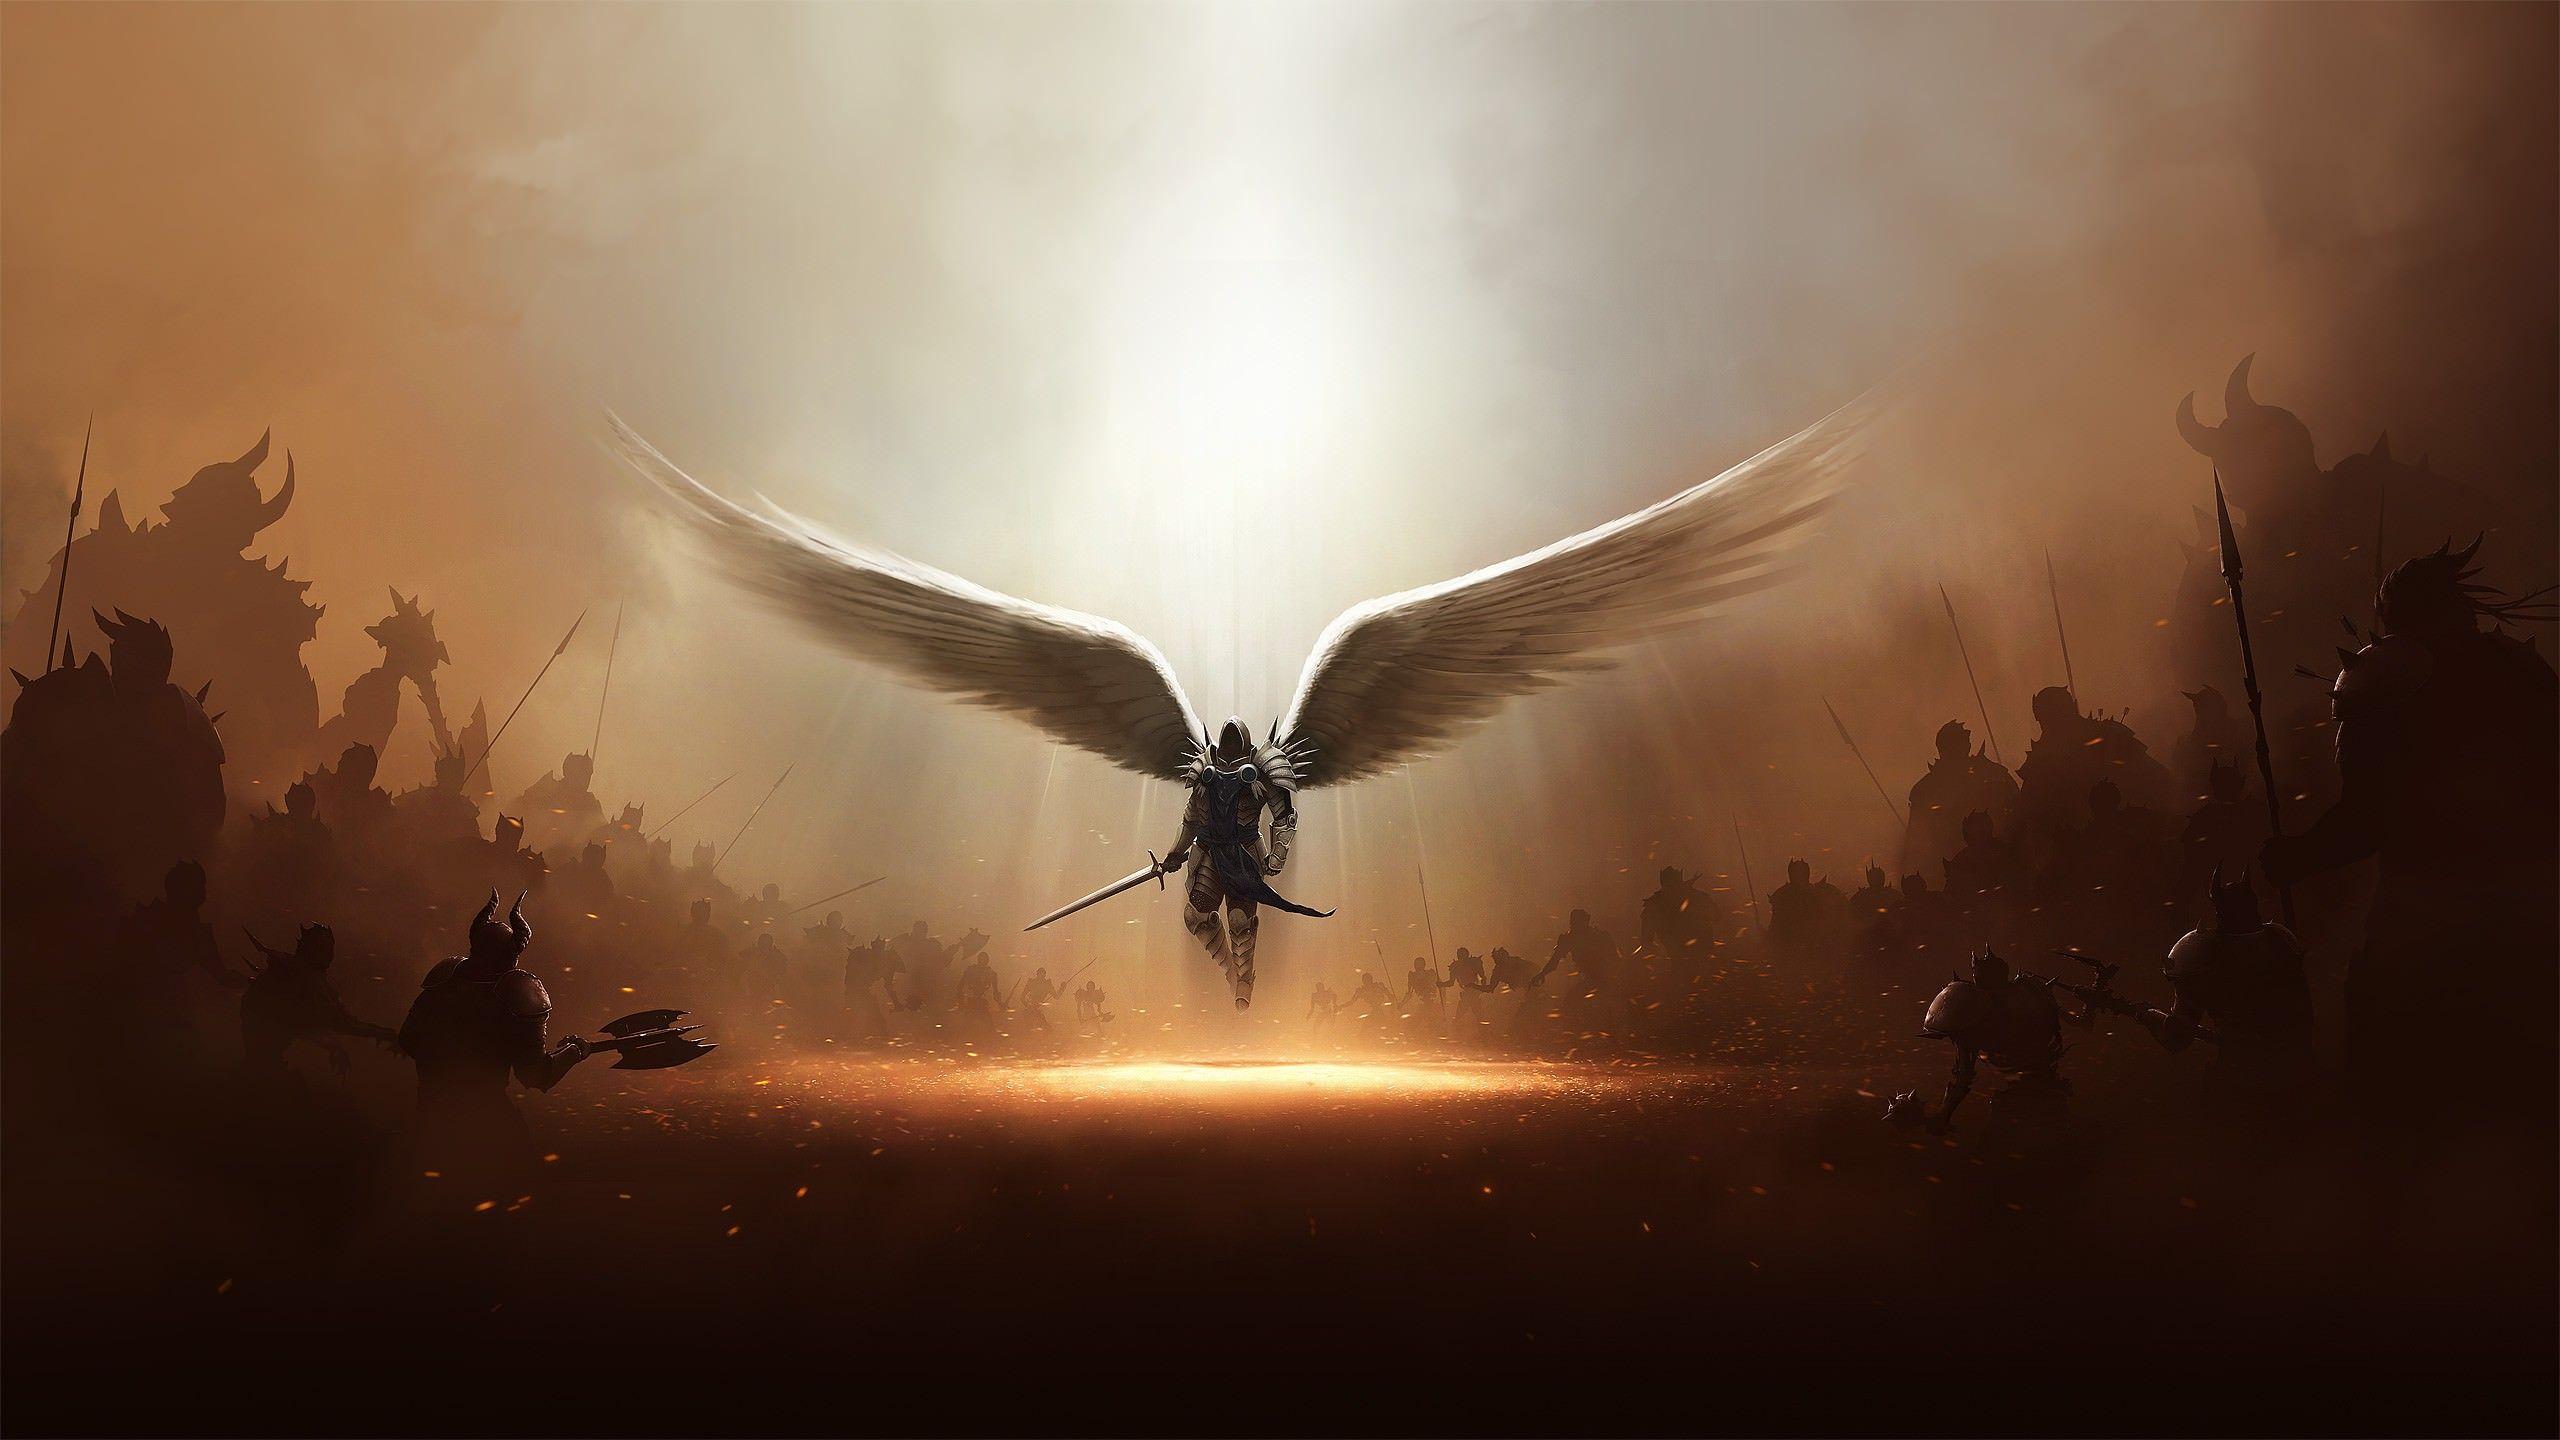 Full Hd 1080p Best Hd Warrior Wallpapers Shunvmall Graphics Digital Wallpaper Warriors Wallpaper Angel Wallpaper